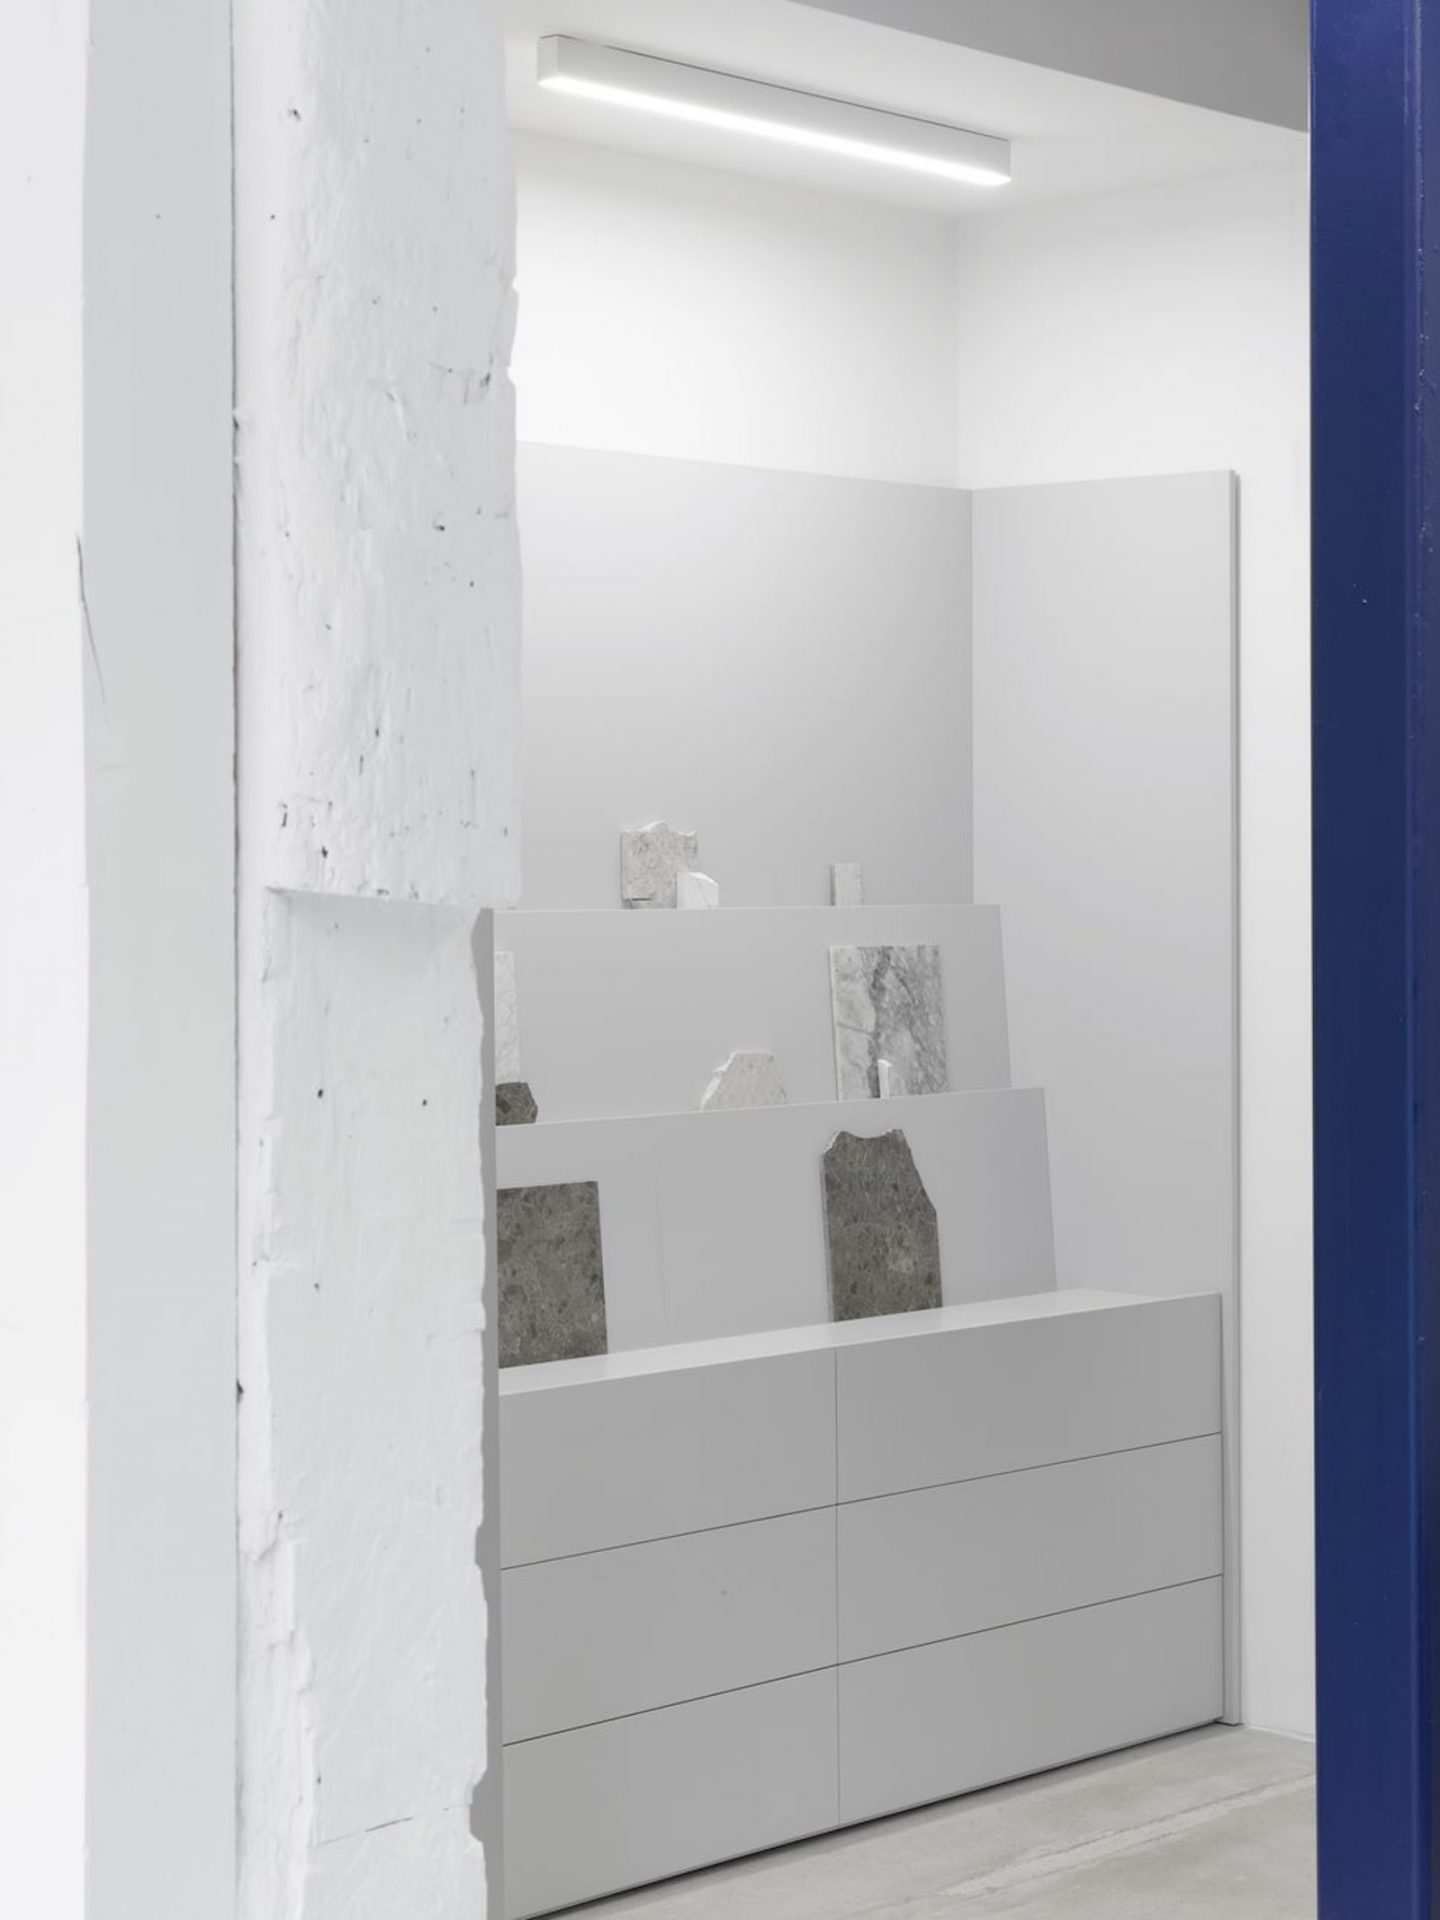 IGNANT-Design-KX-Workshop-Kemmler-013